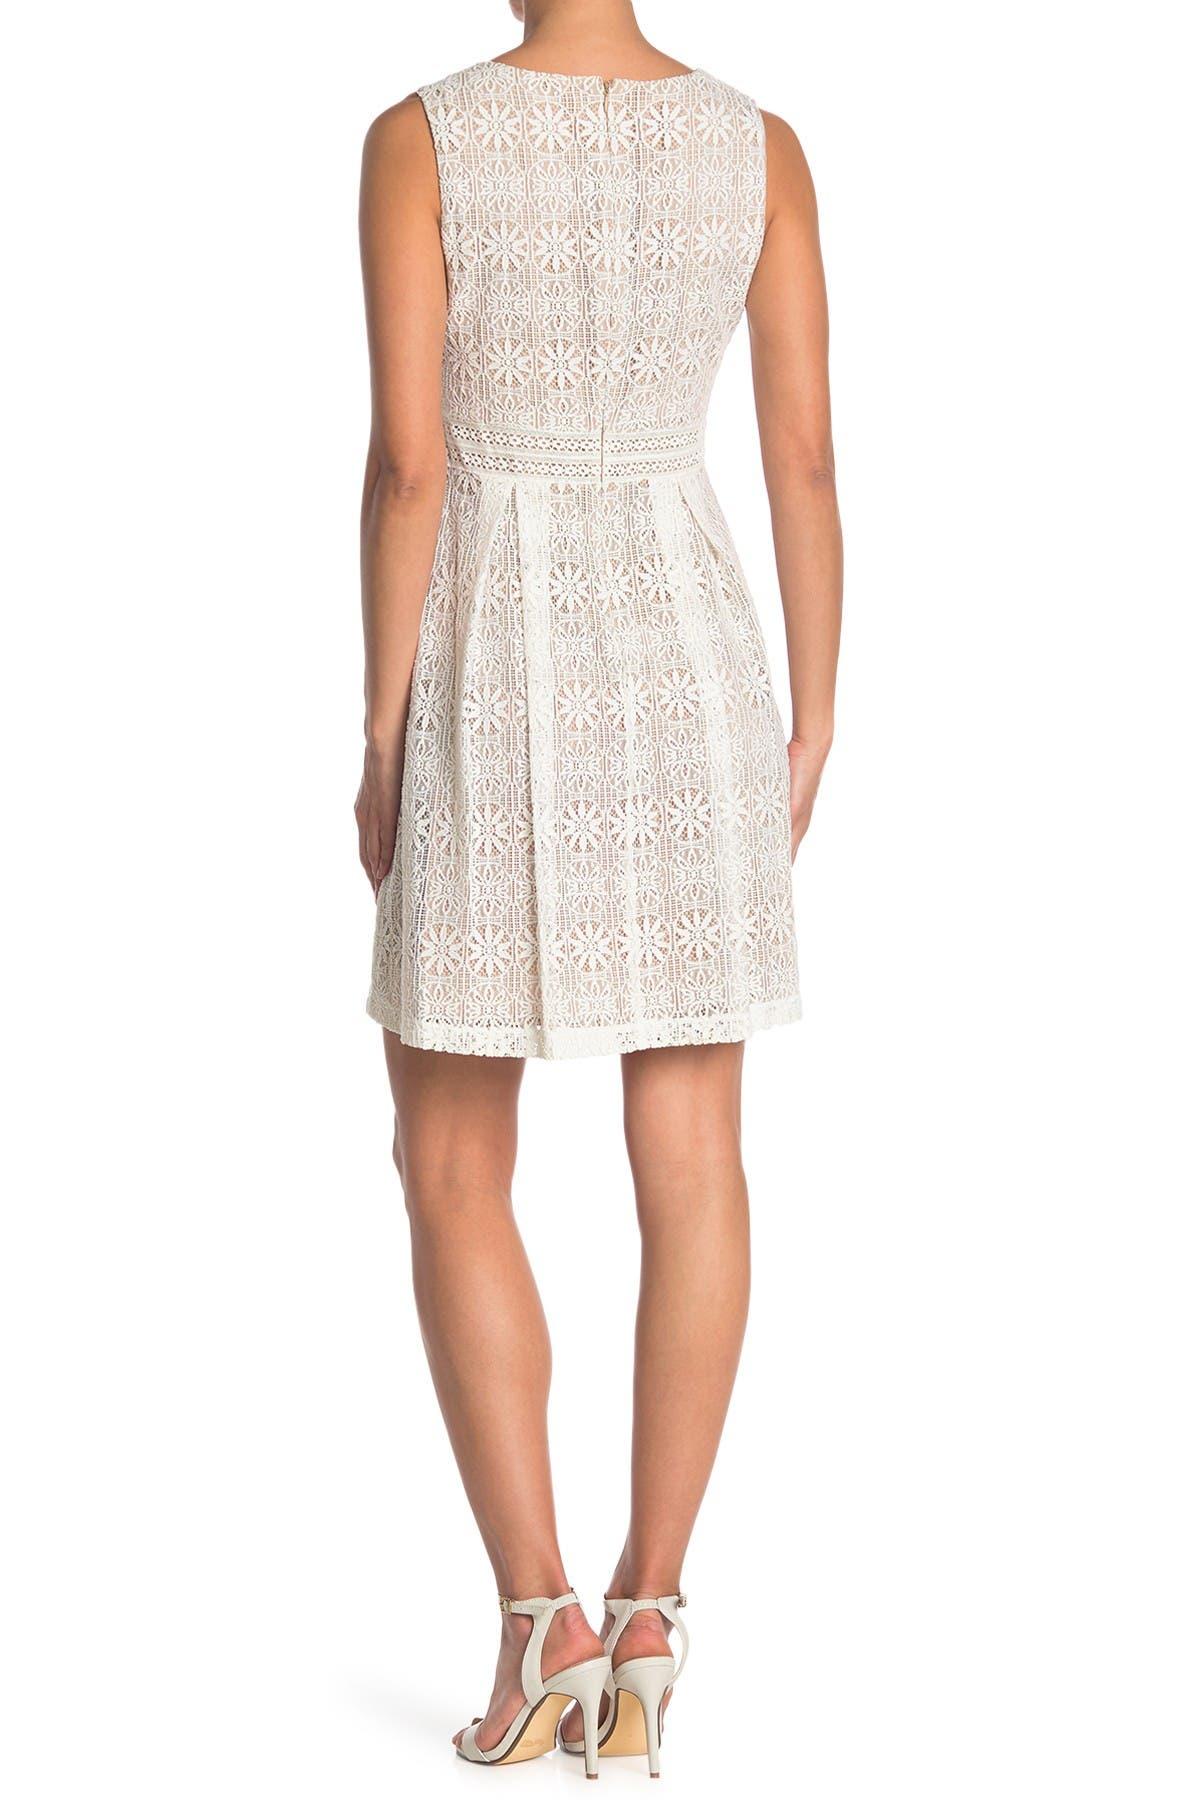 Image of Kensie V-Neck Lace Mini Dress